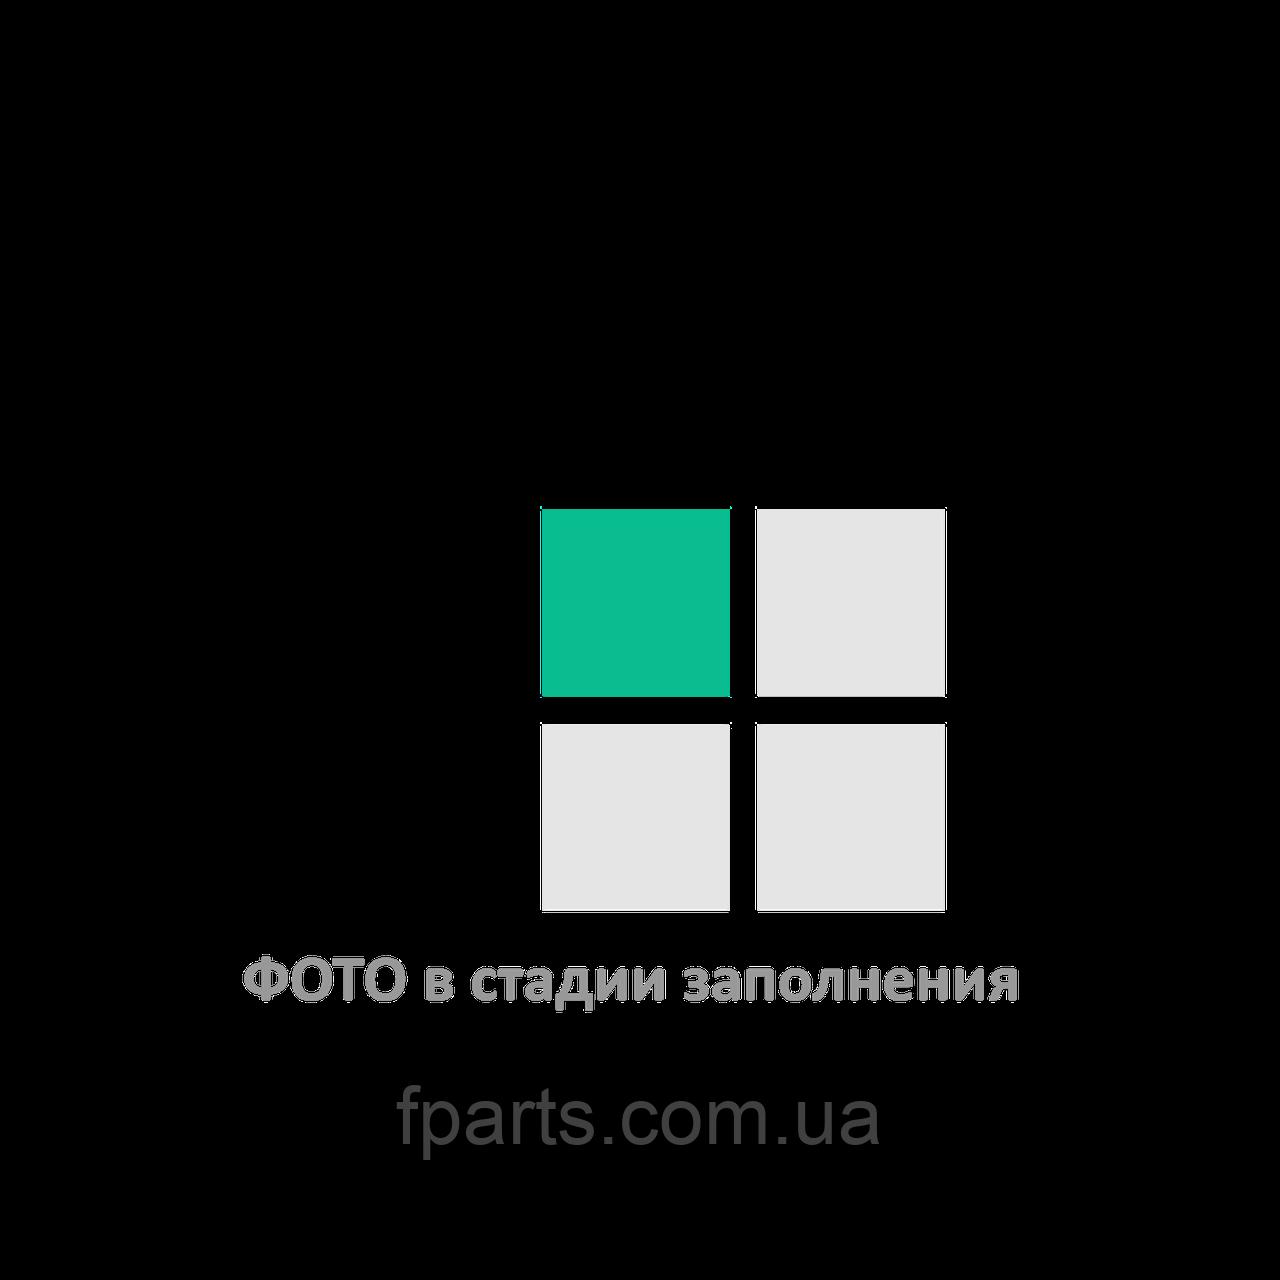 Тачскрин HTC Desire S (S510e) / G12 High Copy